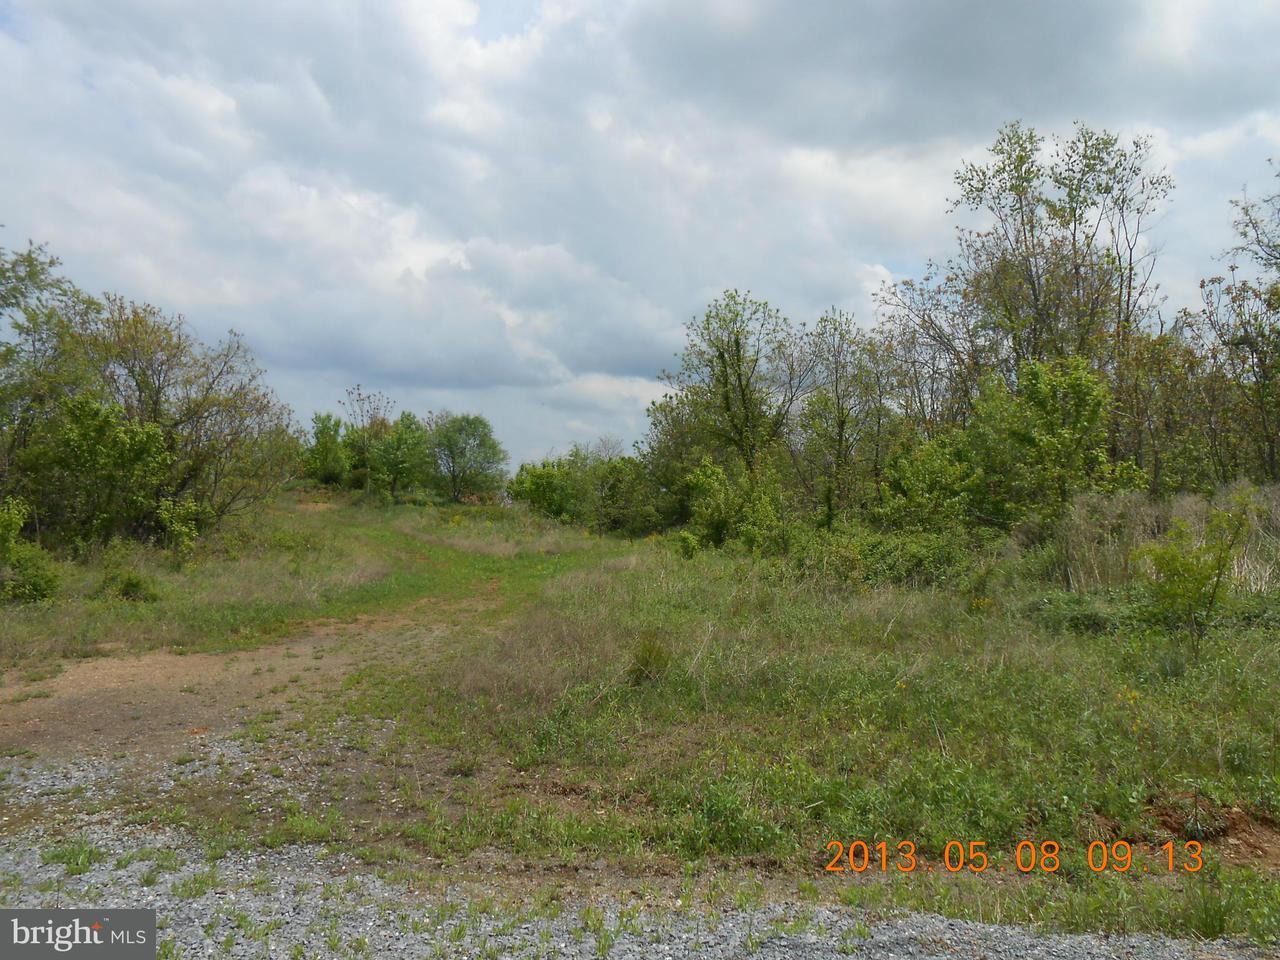 Land for Sale at 27lot # Apple Jack Ct Mercersburg, Pennsylvania 17236 United States